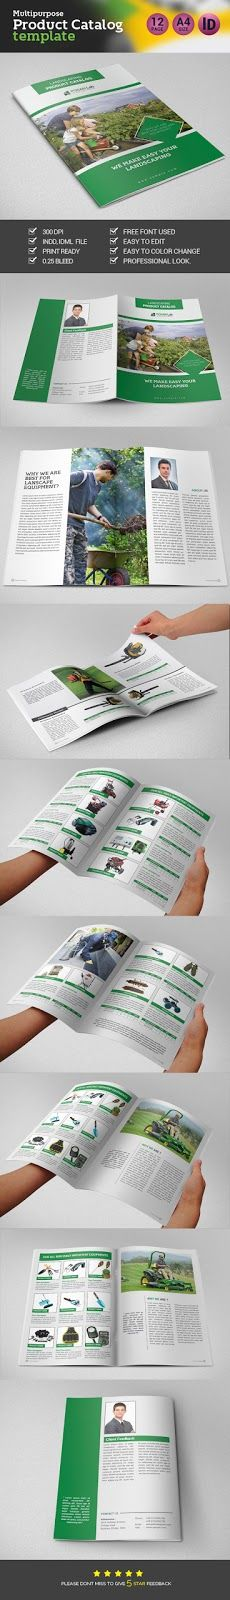 Product Catalog Brochure | Template Market